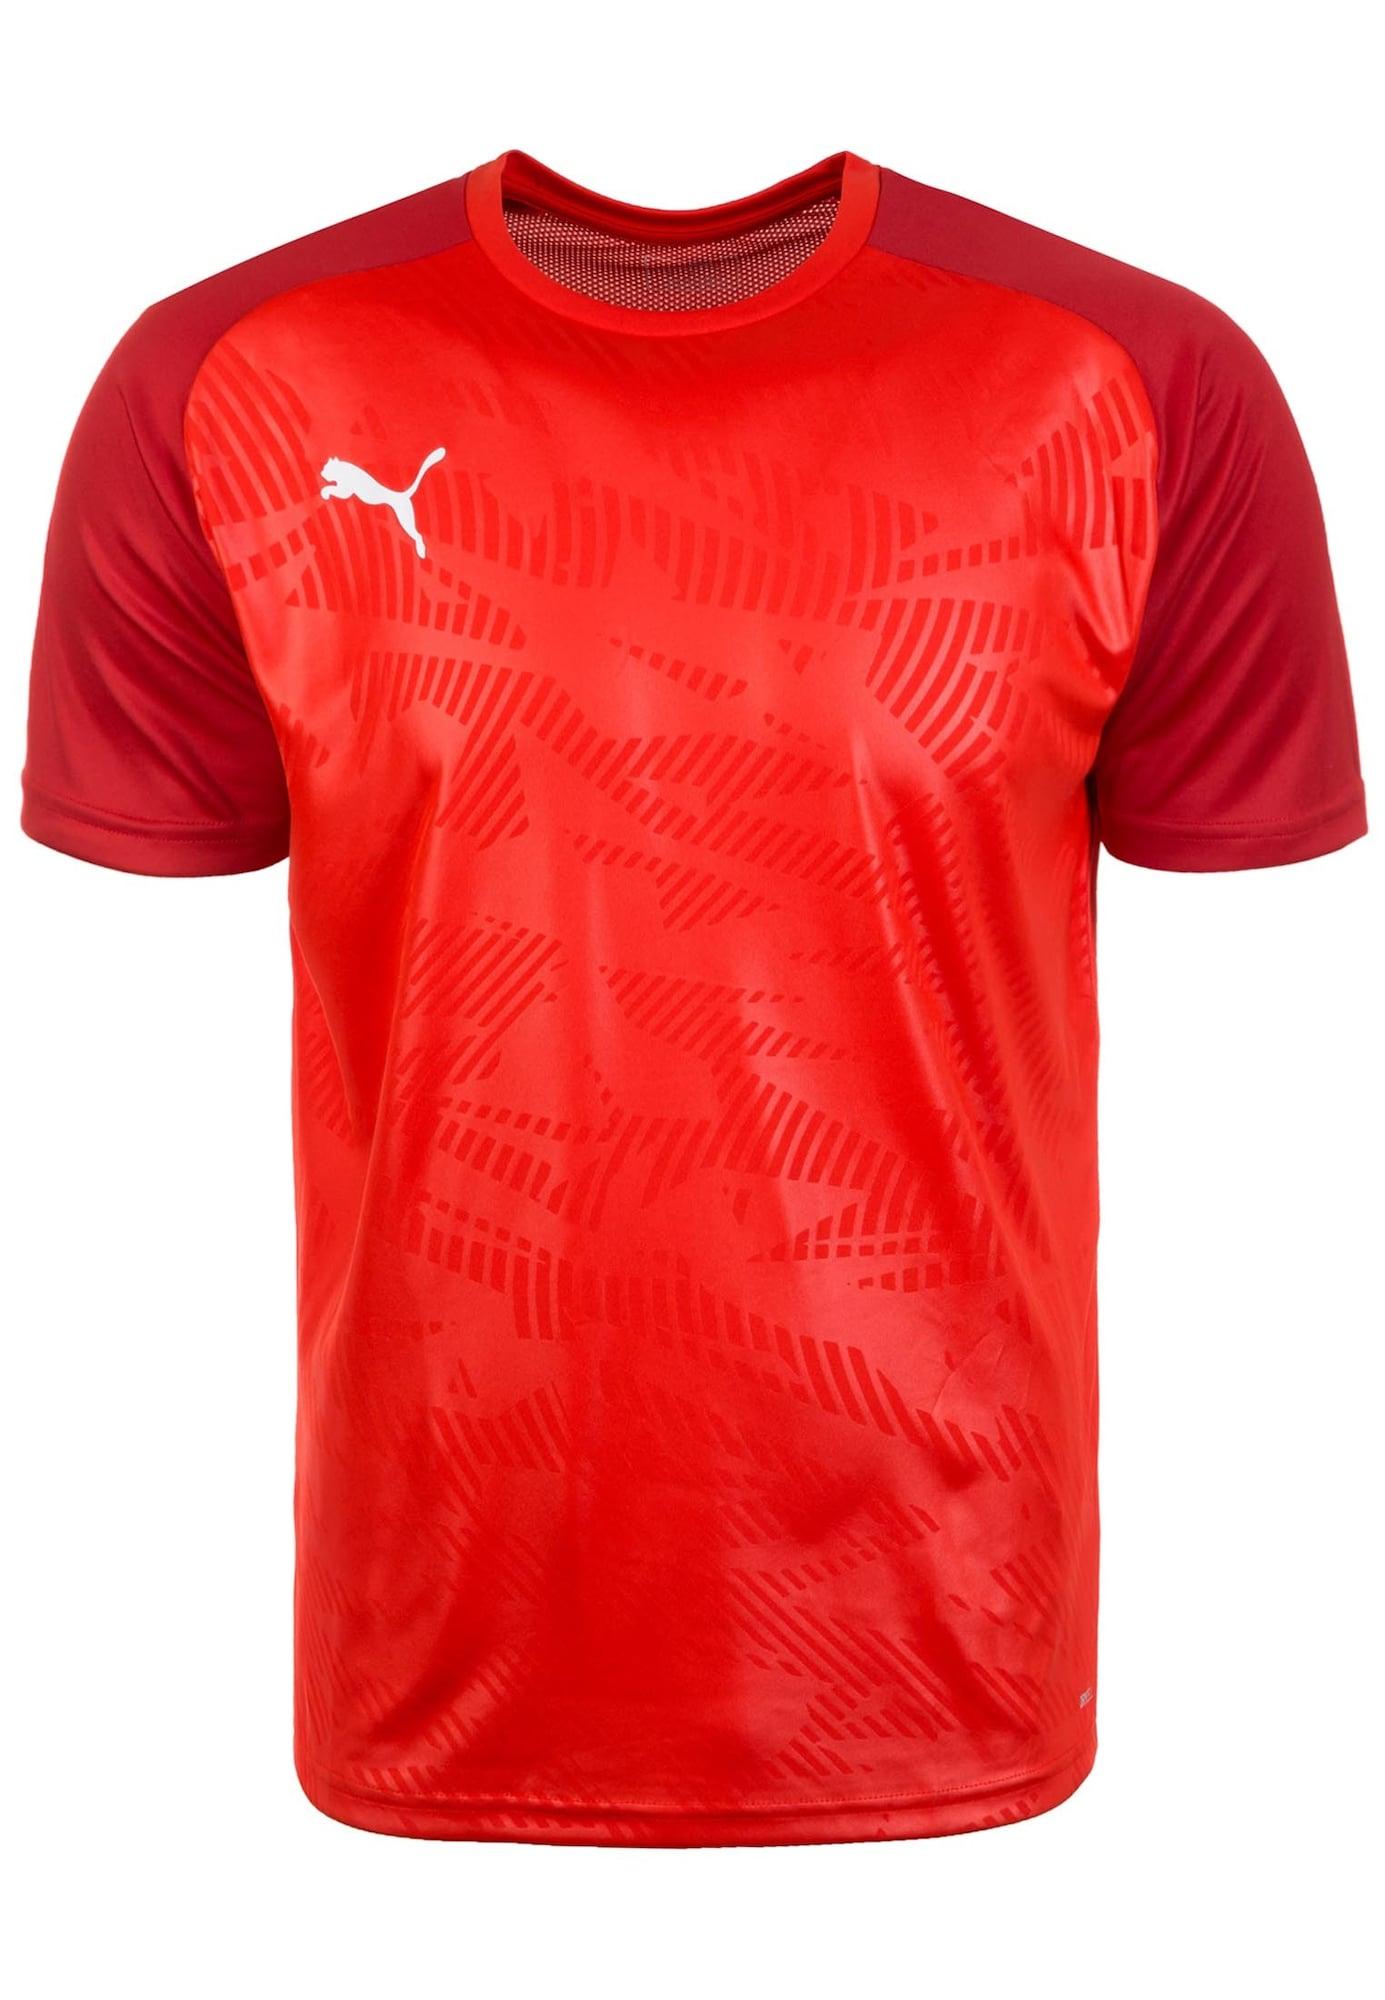 Trainingsshirt 'Cup' | Sportbekleidung > Sportshirts | Rot - Dunkelrot | Puma